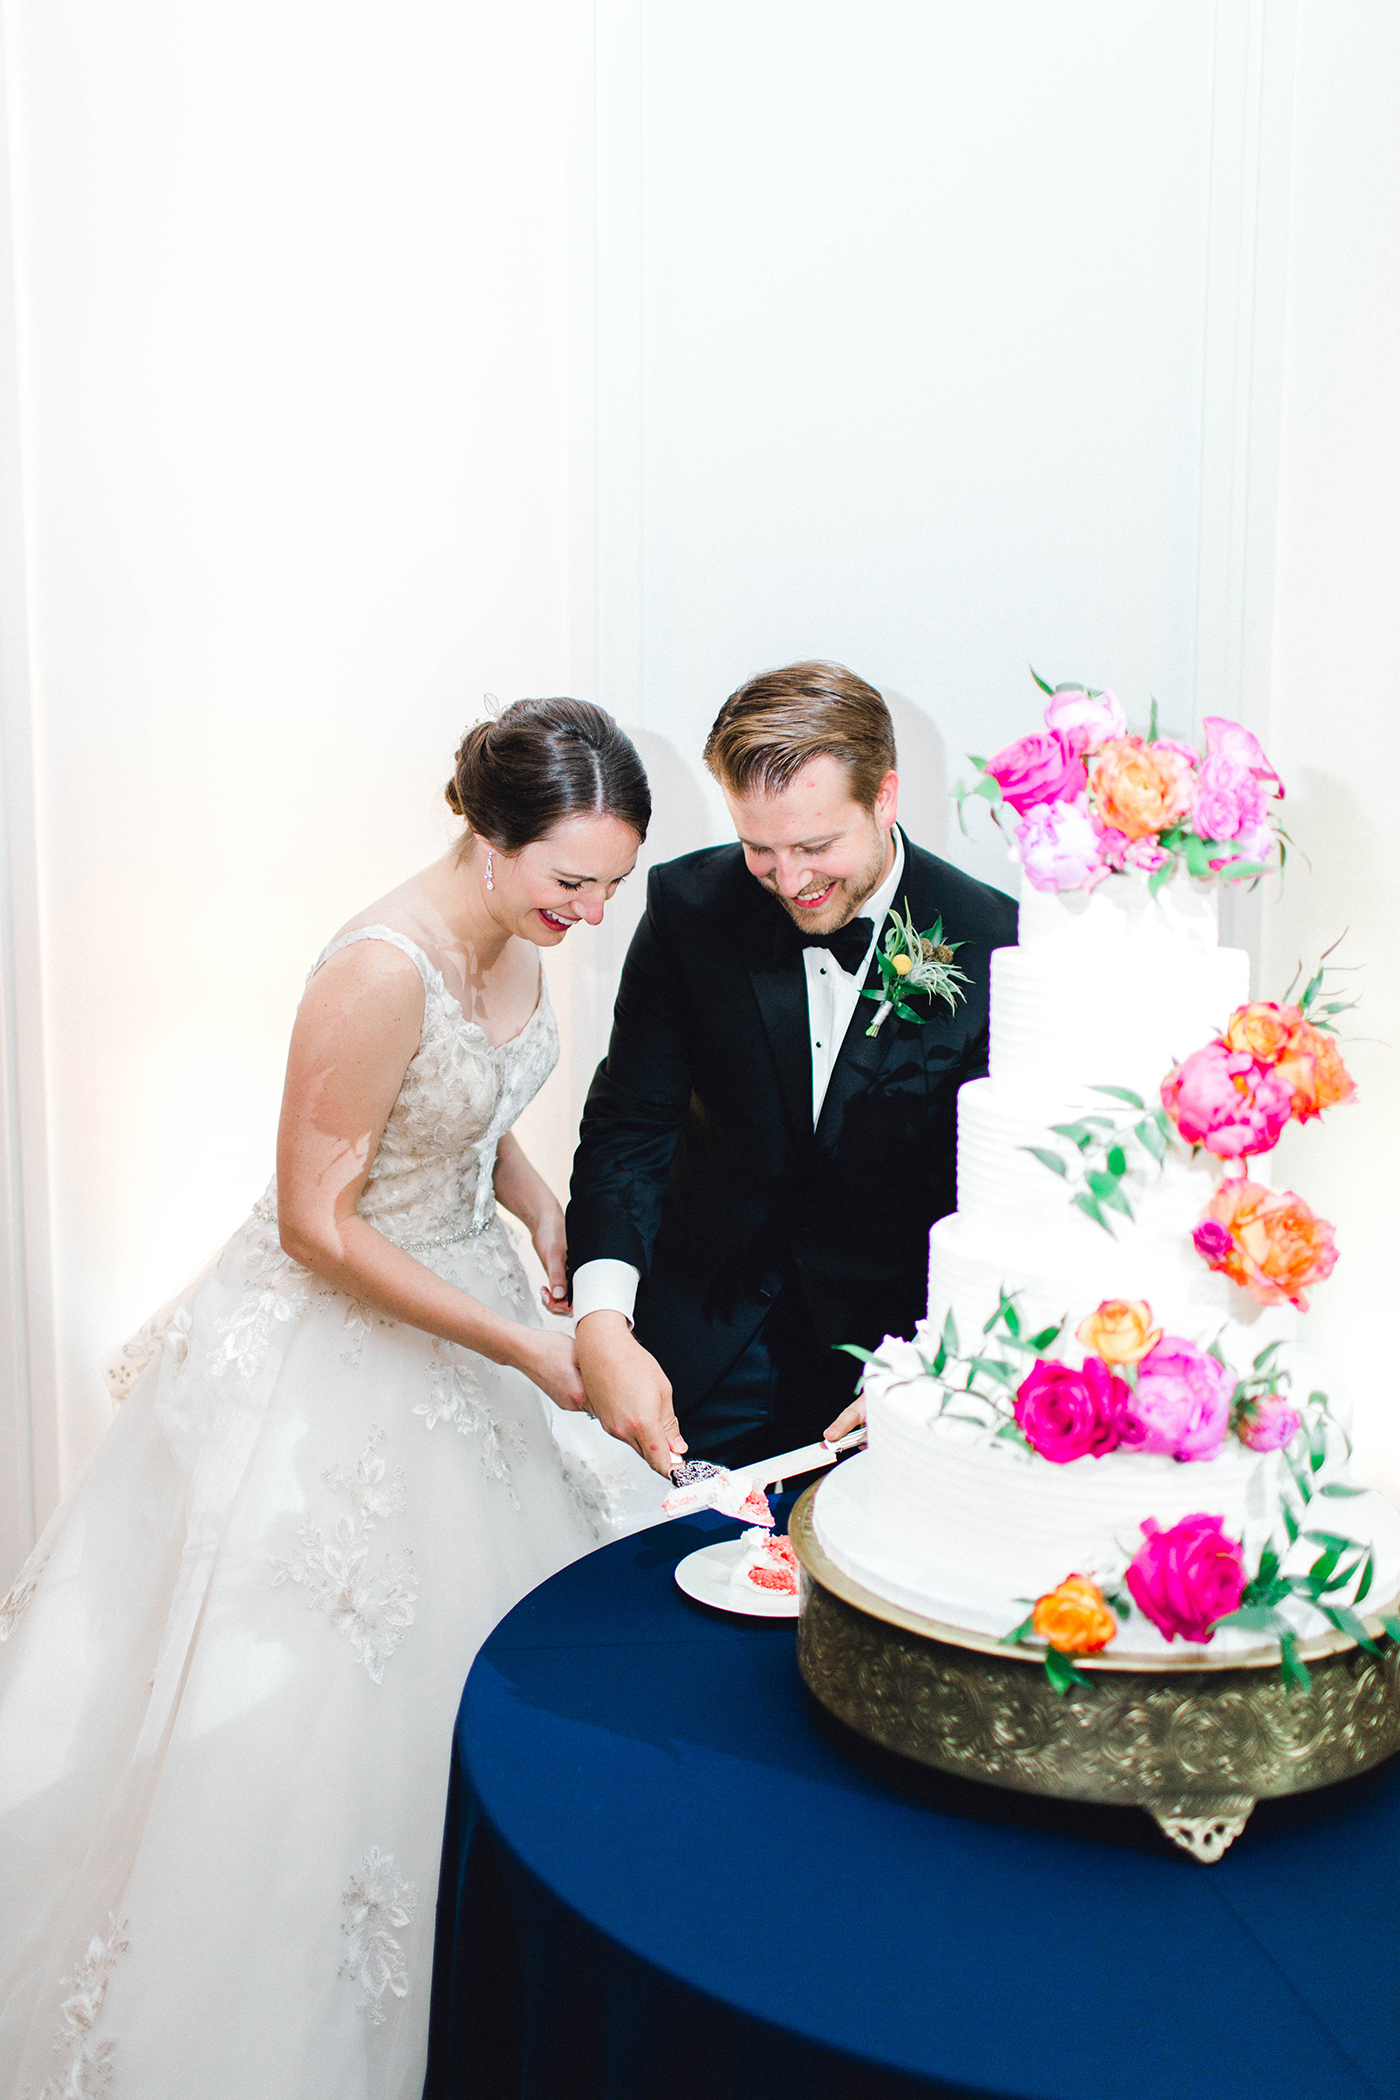 Dallas TX Wedding Planner - Allday Events - Hall on Dragon Wedding - 00055.jpg